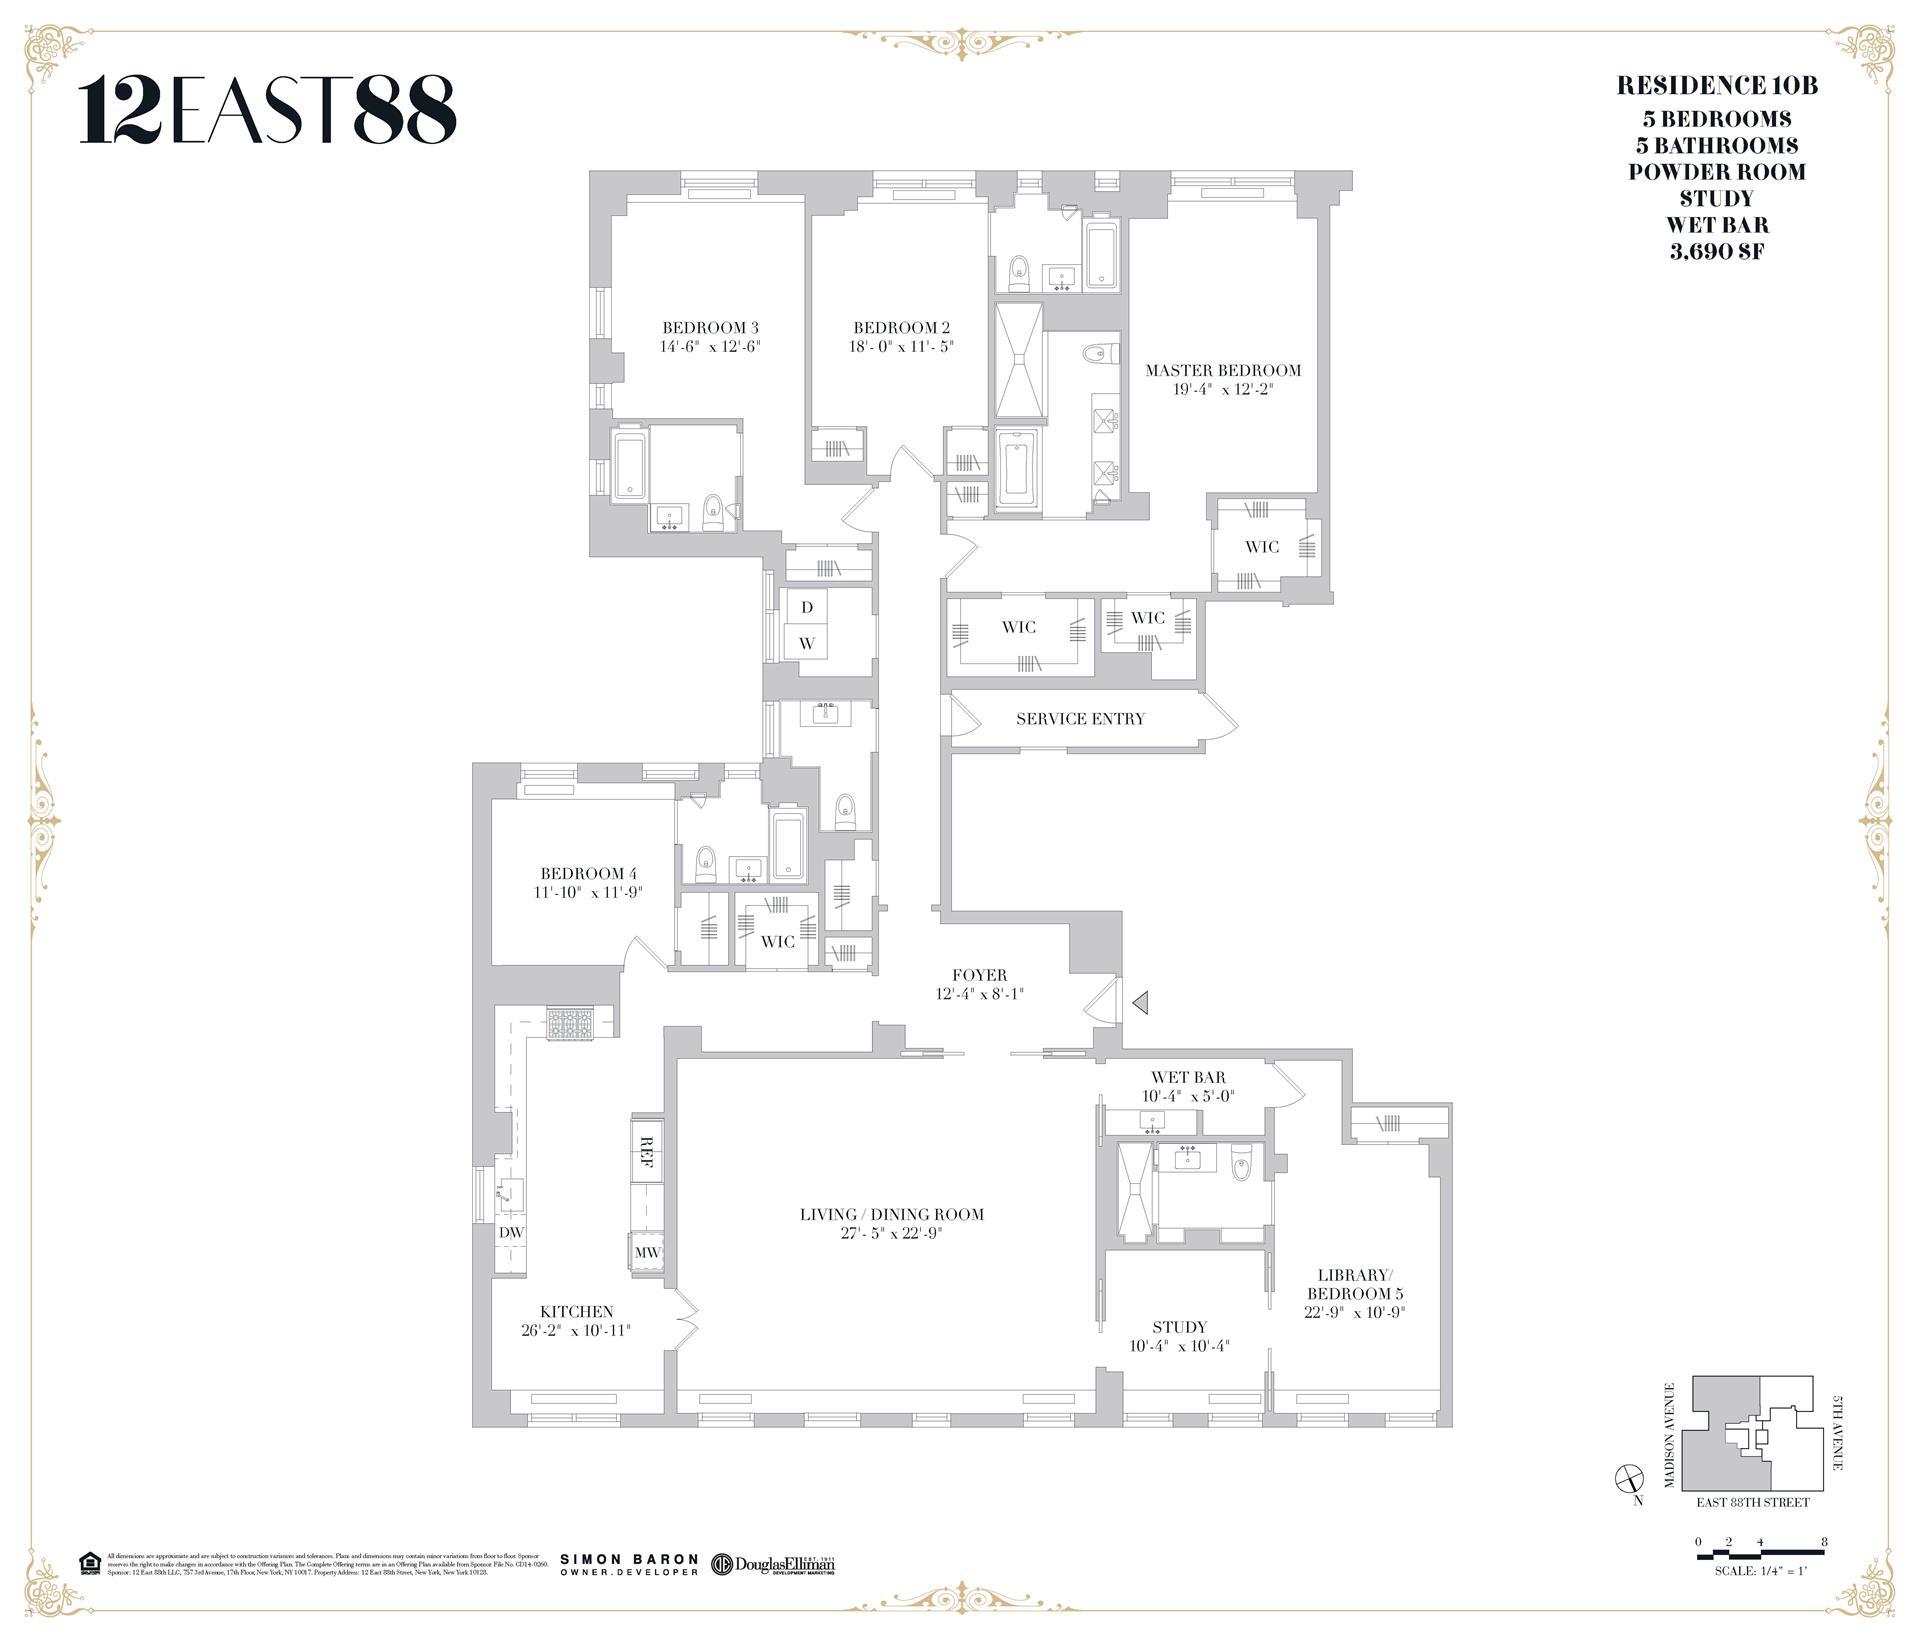 Floor plan of 12 East 88th St, 10B - Carnegie Hill, New York